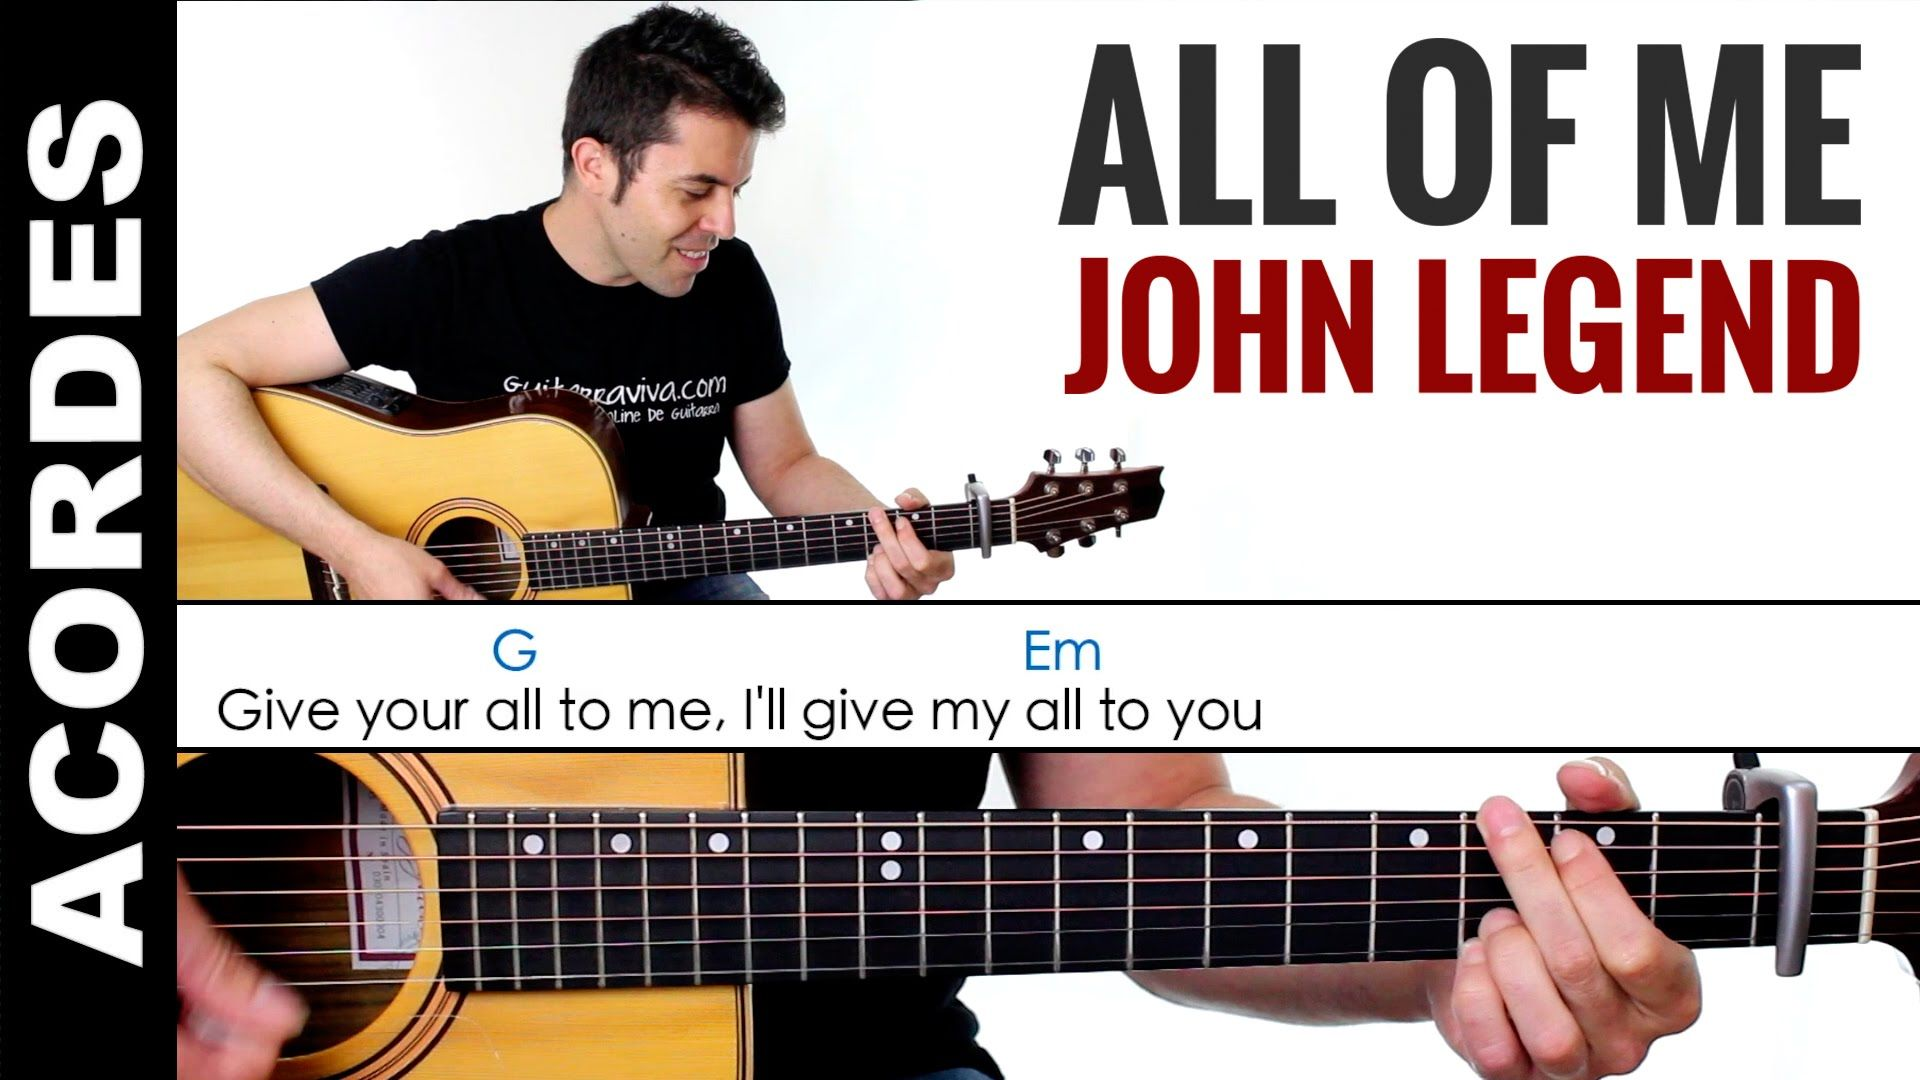 All of me acordes guitarra chords tutorial how to play clase all of me acordes guitarra chords tutorial how to play clase baditri Image collections